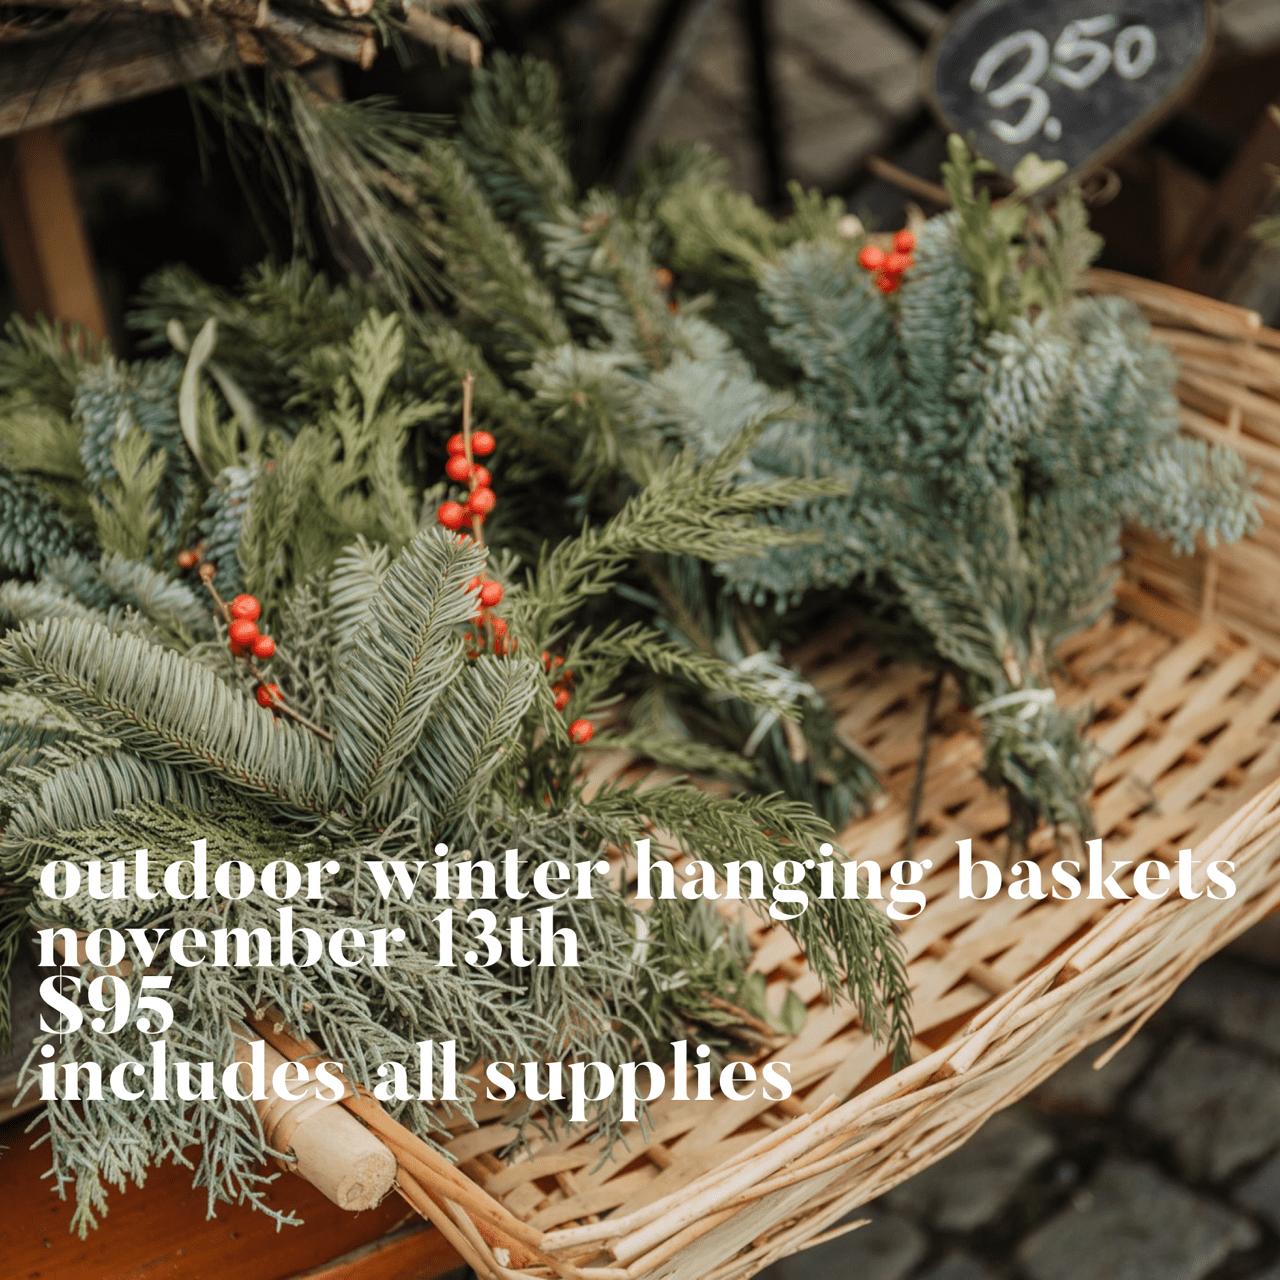 Outdoor-Winter-Hanging-Basket-Nov-13-Square